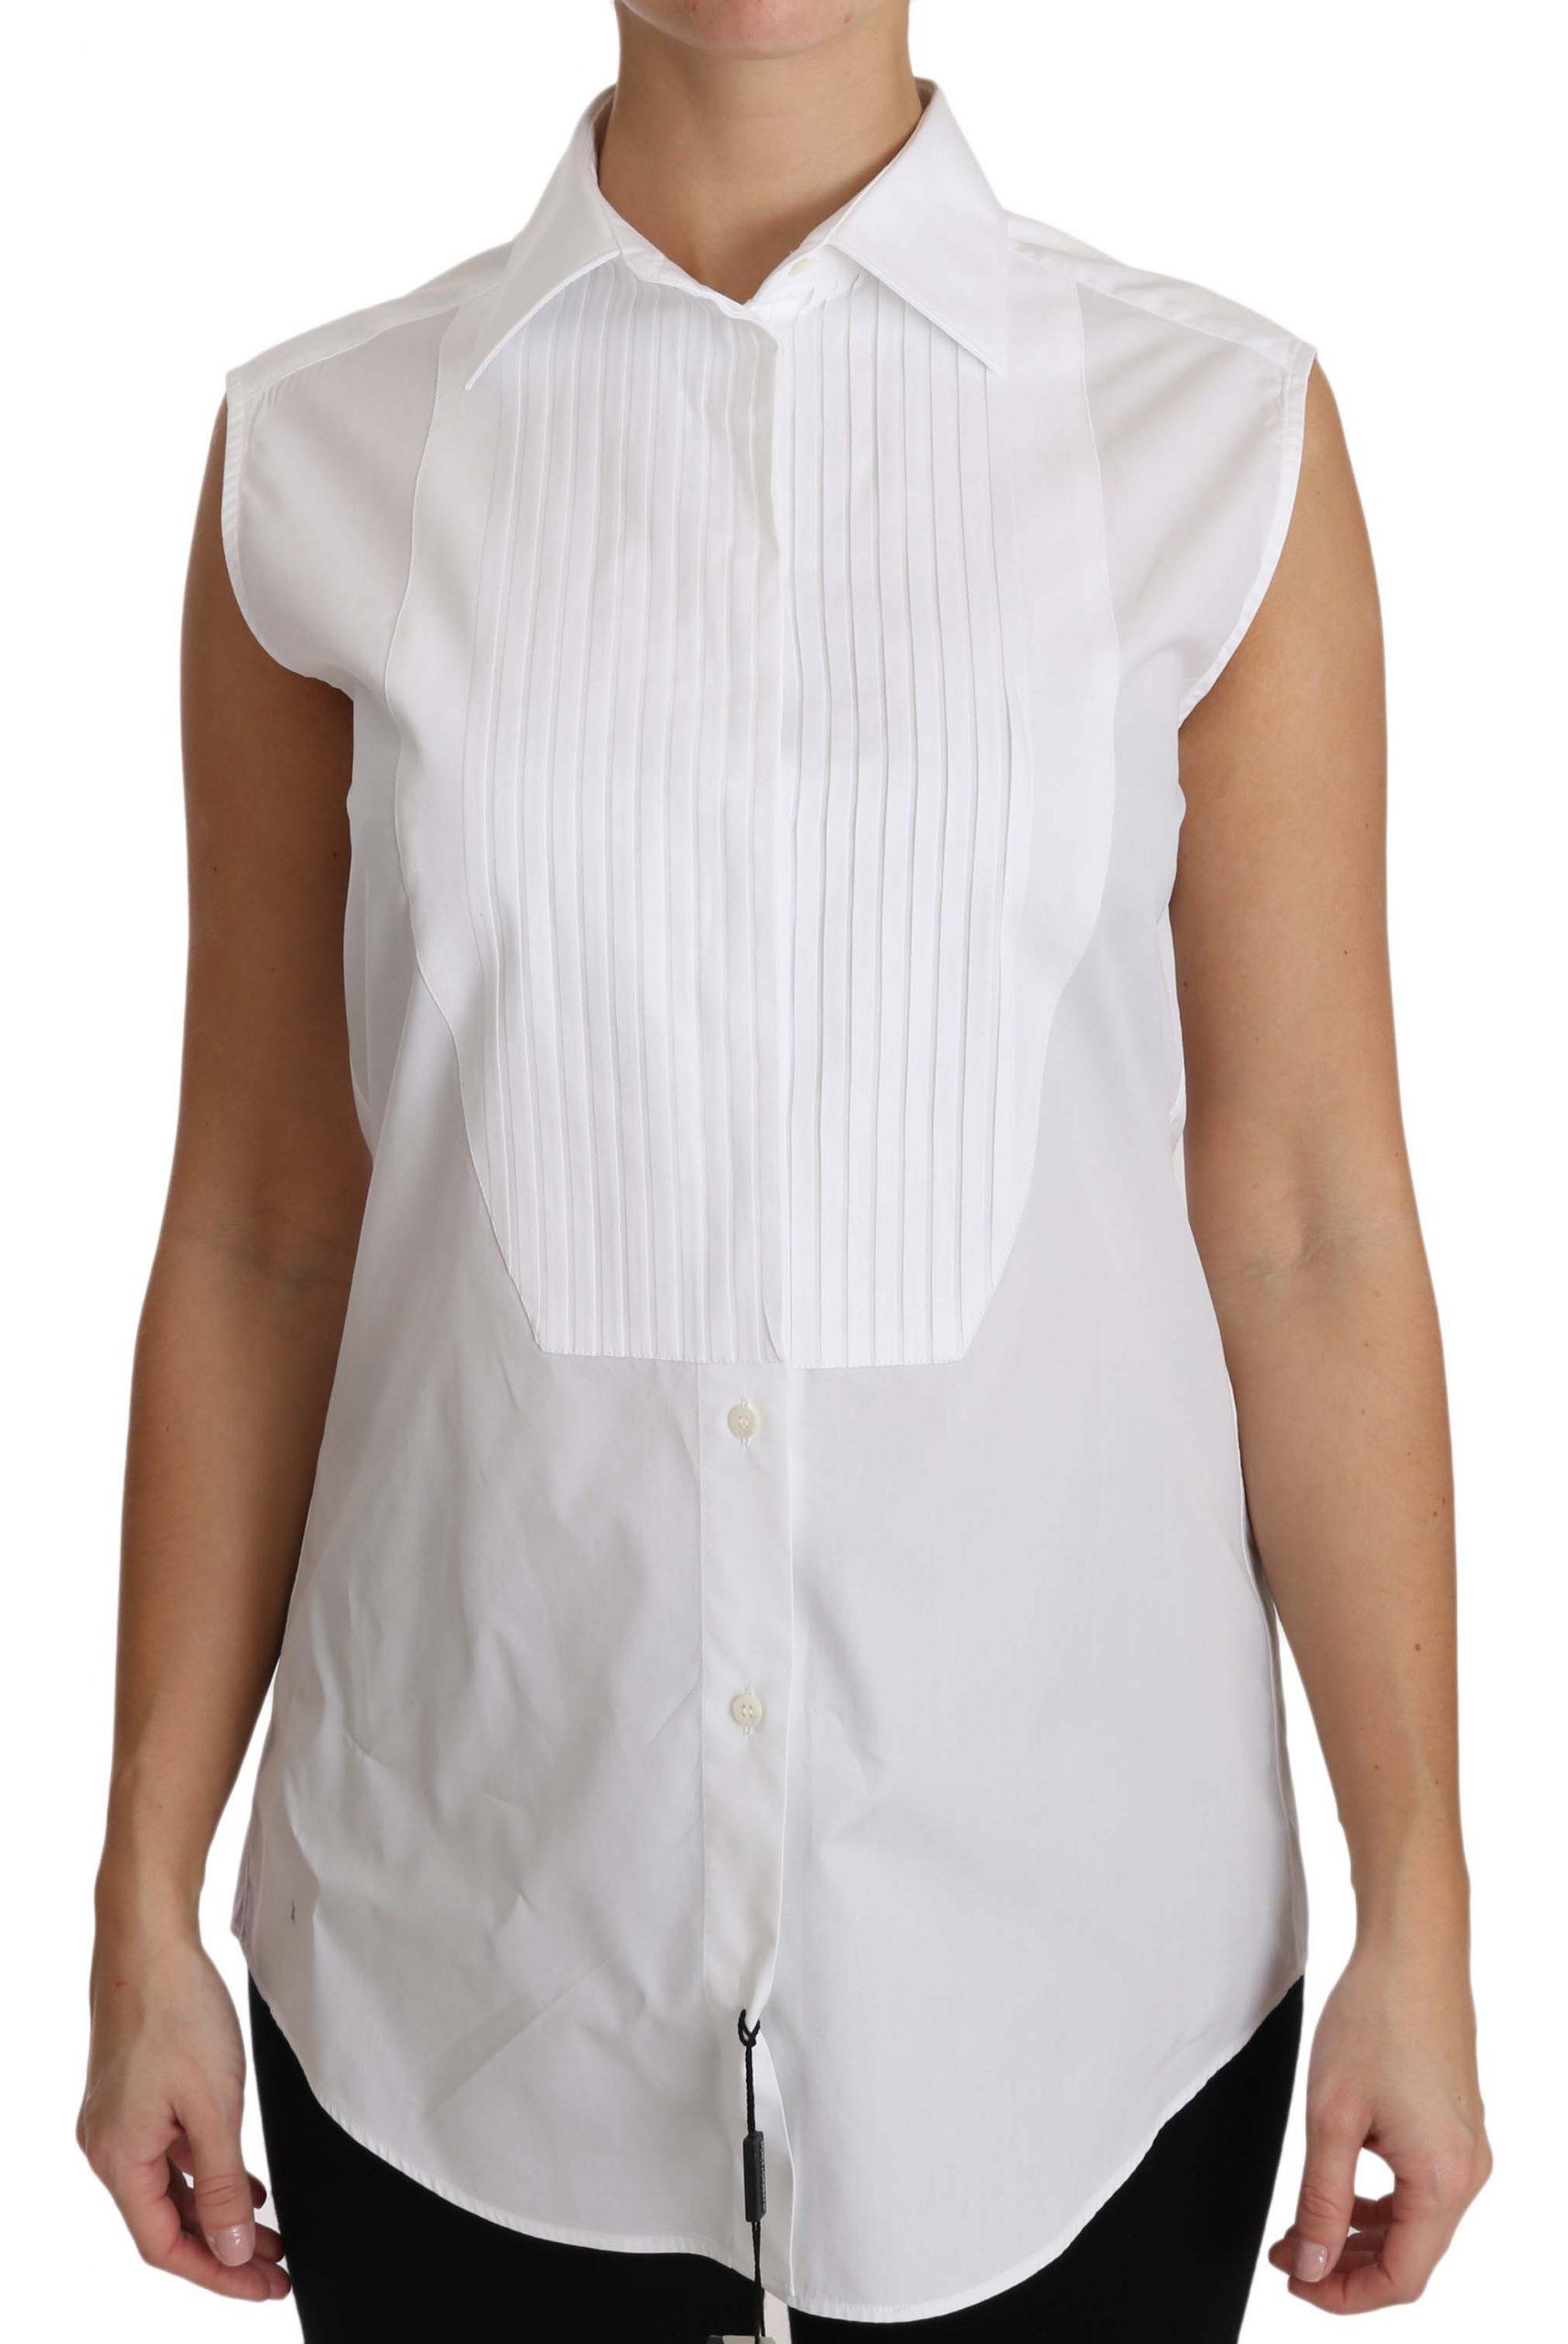 Dolce & Gabbana Women's Collar Sleeveless Tops White TSH2948 - IT42 M